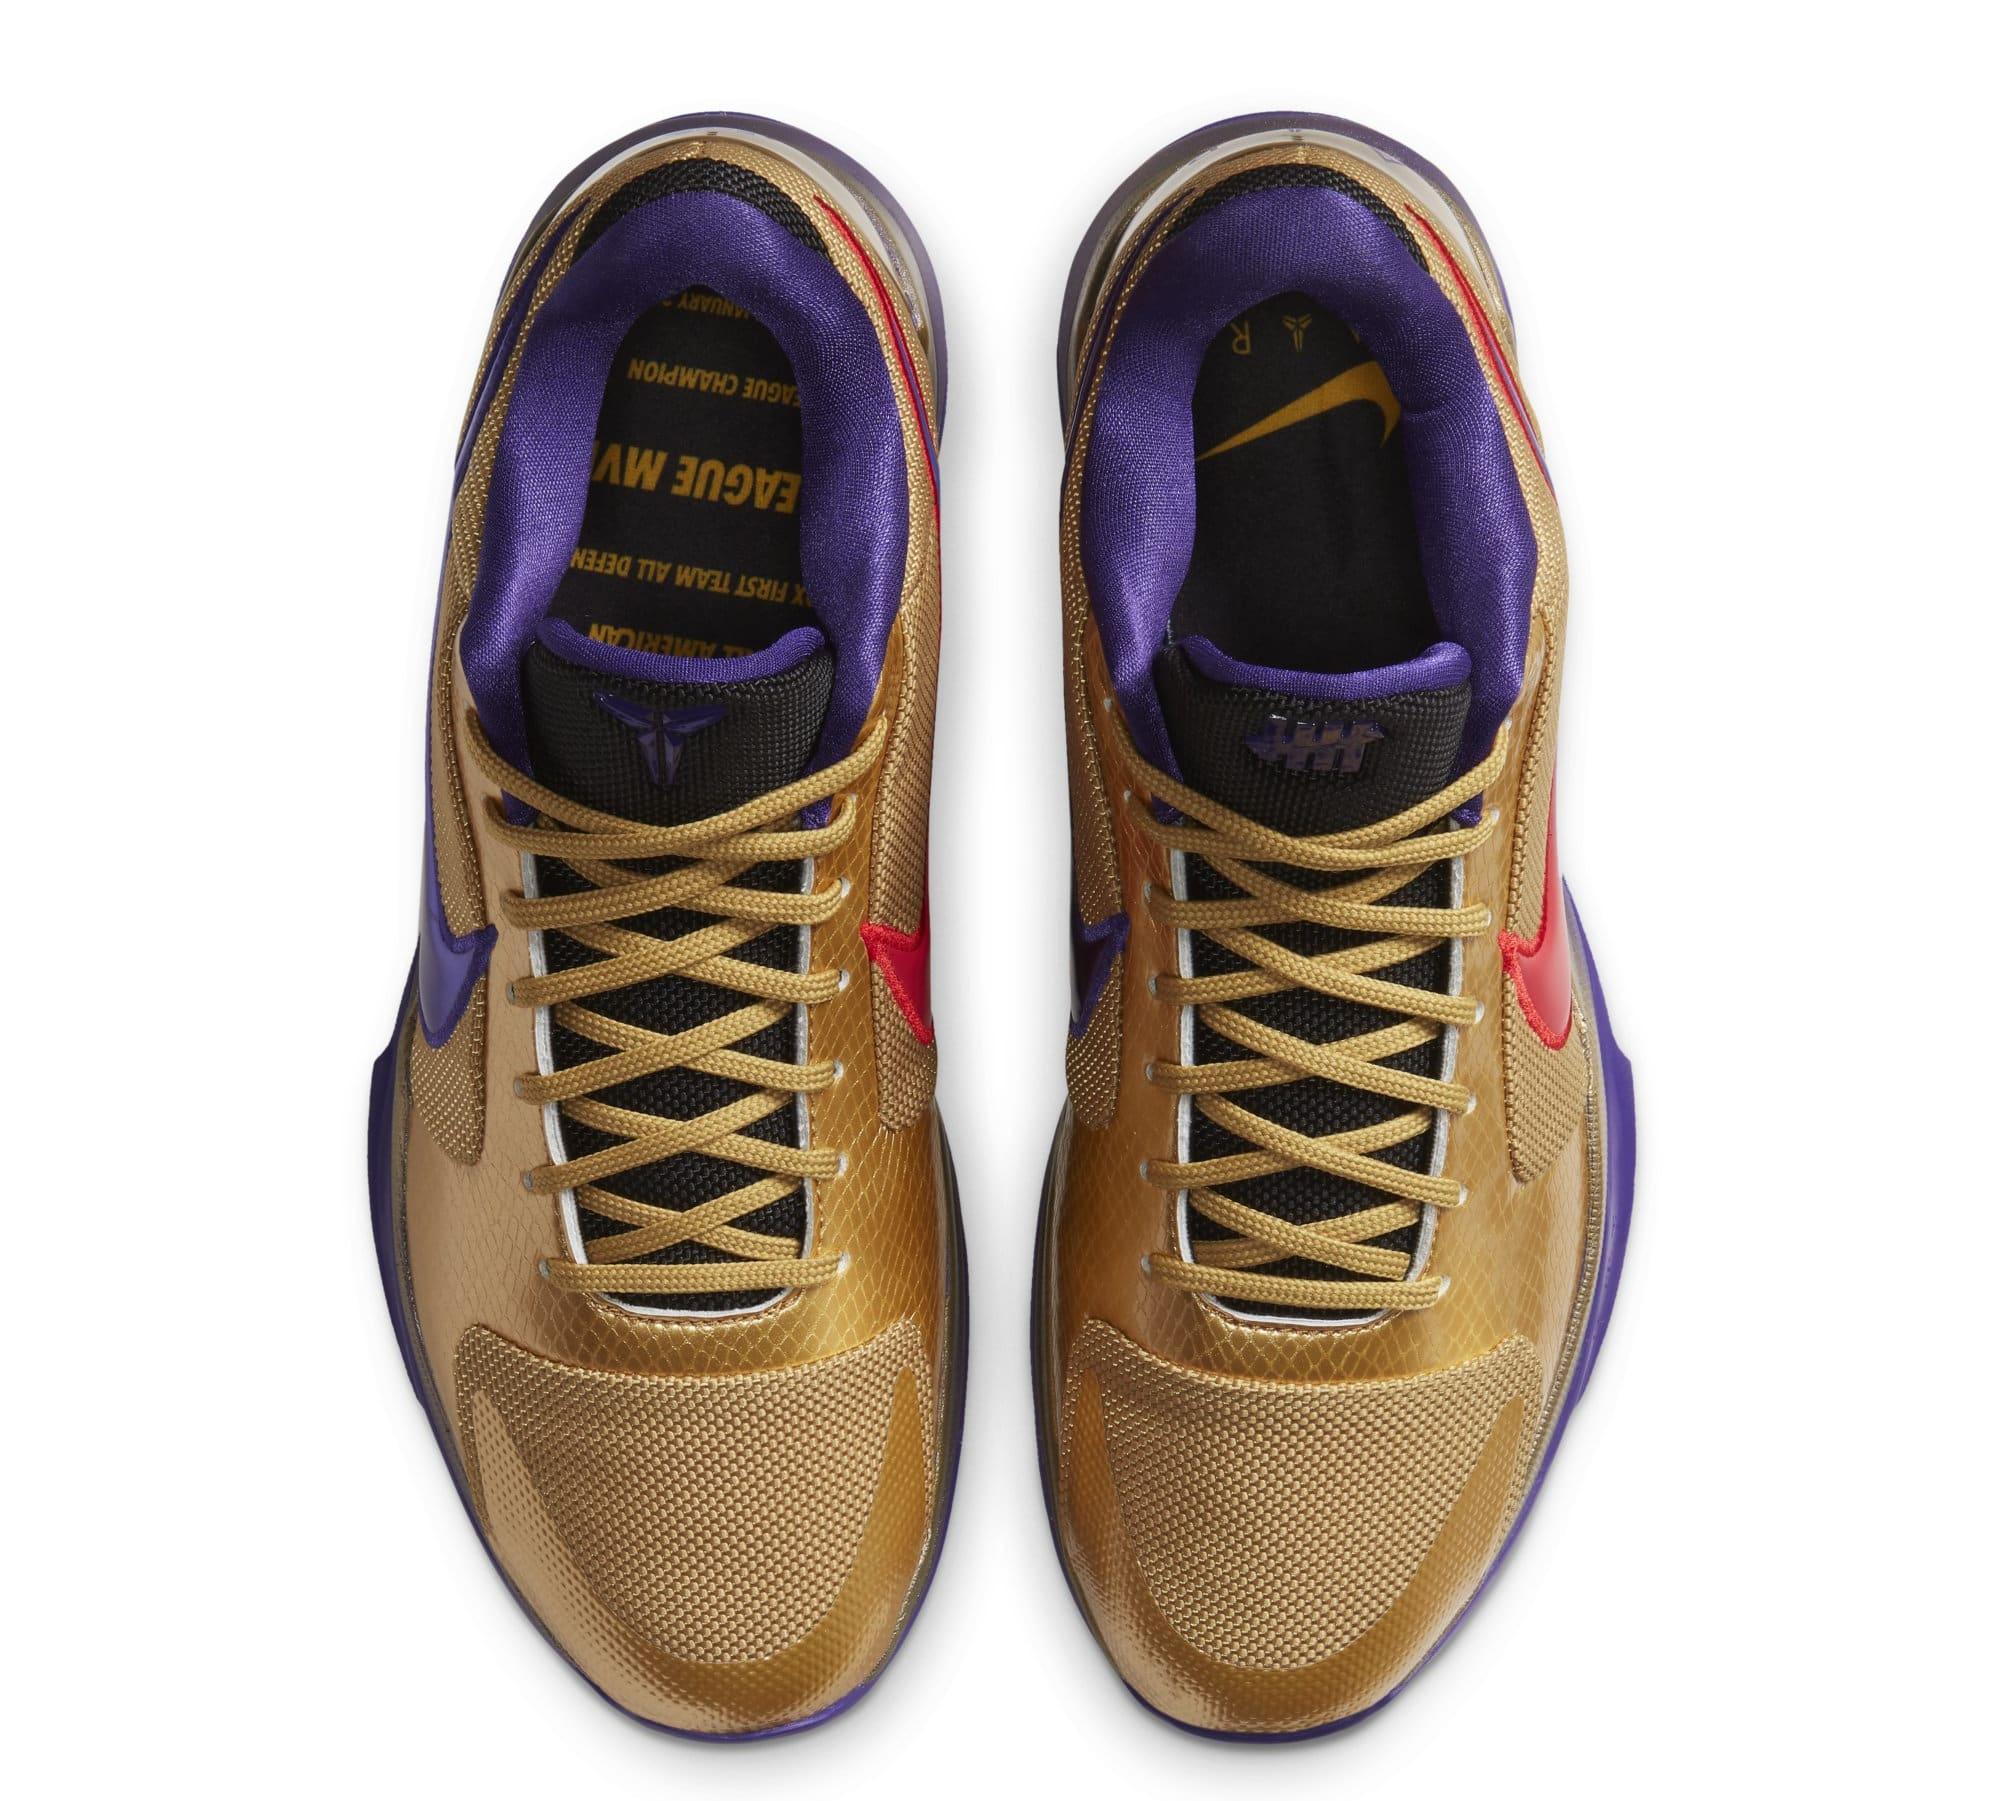 Undefeated x Nike Kobe 5 Protro 'Hall of Fame' DA6809-700 (Top)